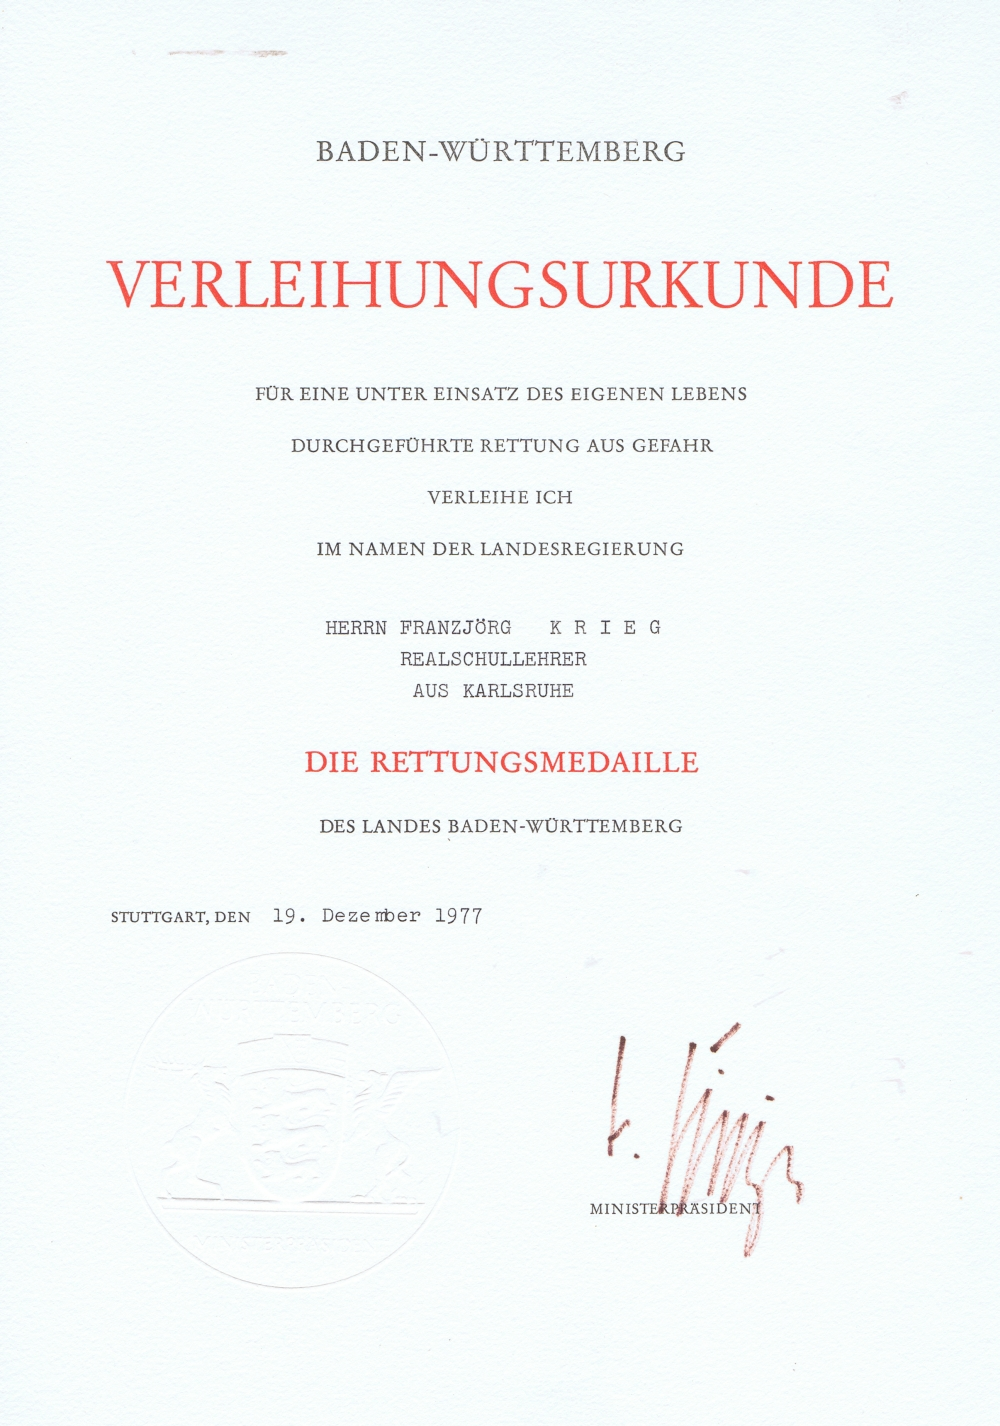 19771219_rettungsmedaille_urkunde